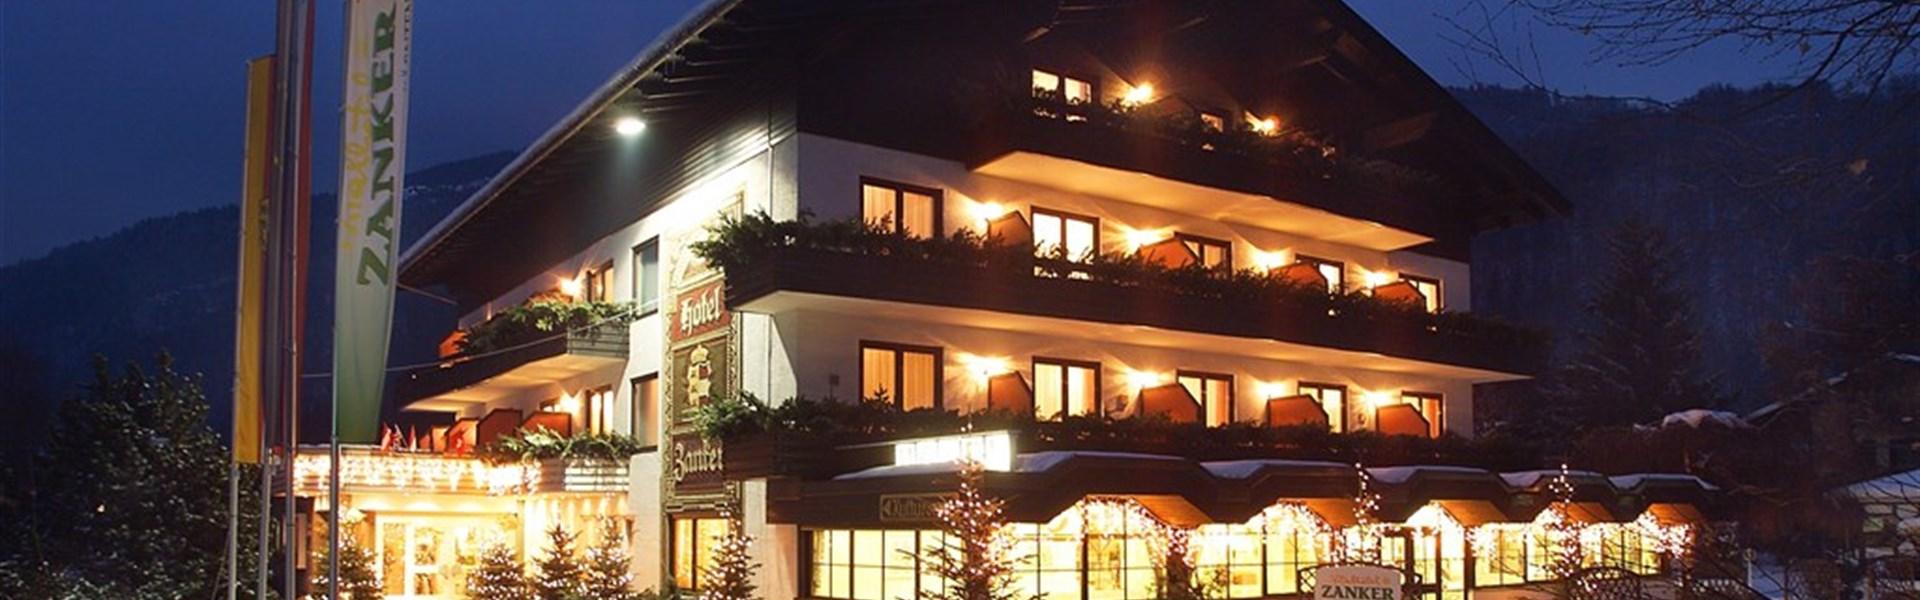 Hotel Zanker -